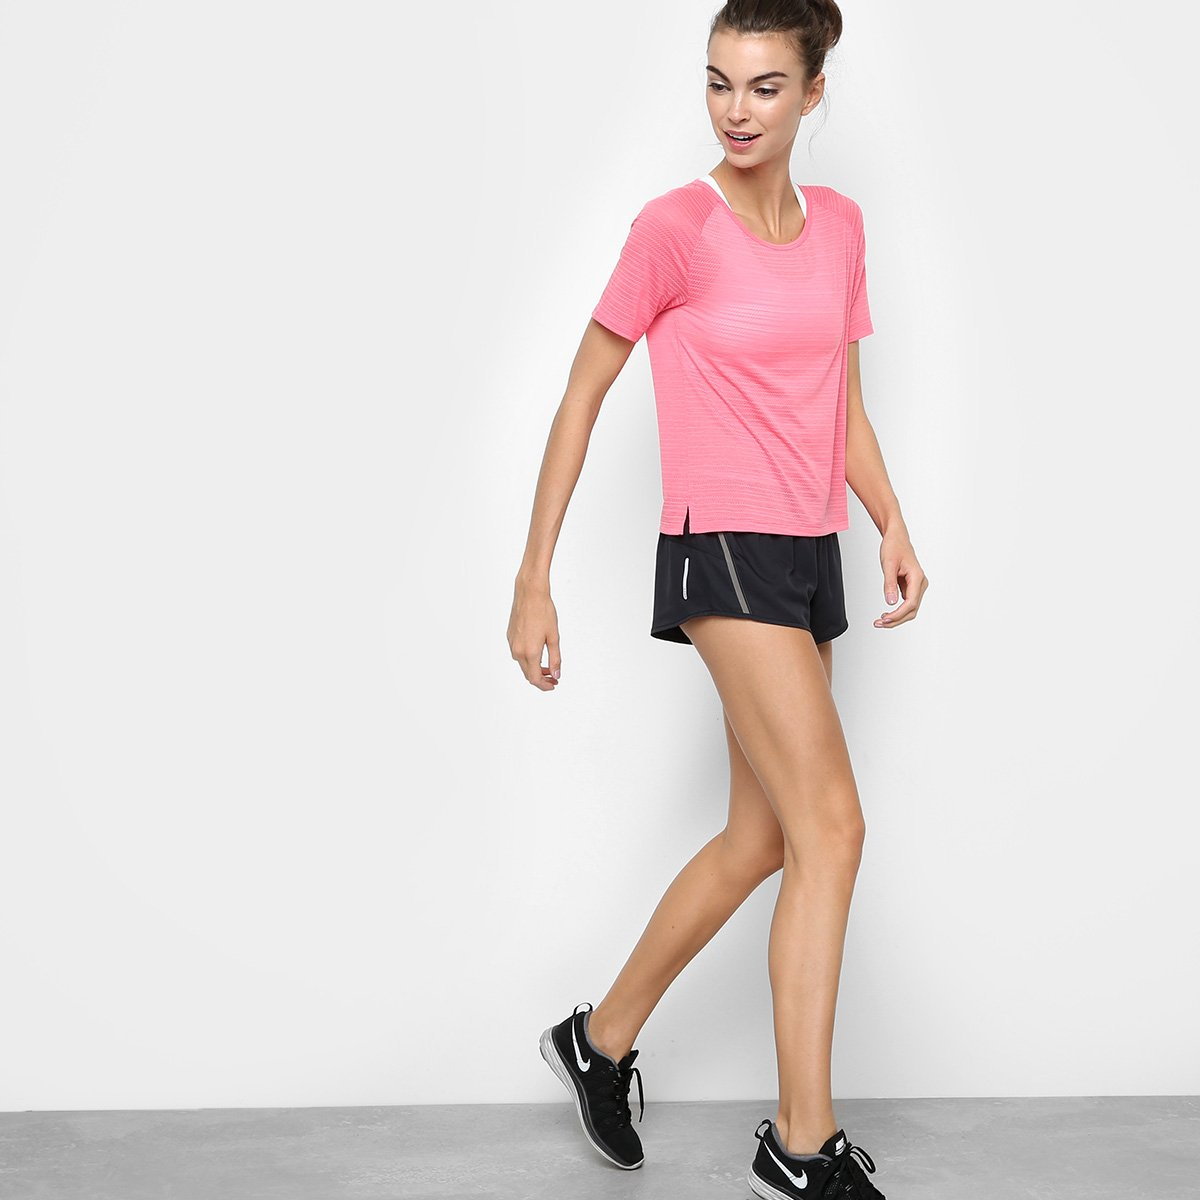 Nike Breathe Breathe Feminina Miler Camiseta Rosa SS Miler Feminina Camiseta Camiseta Rosa Nike SS Nike Ogg7wxtn